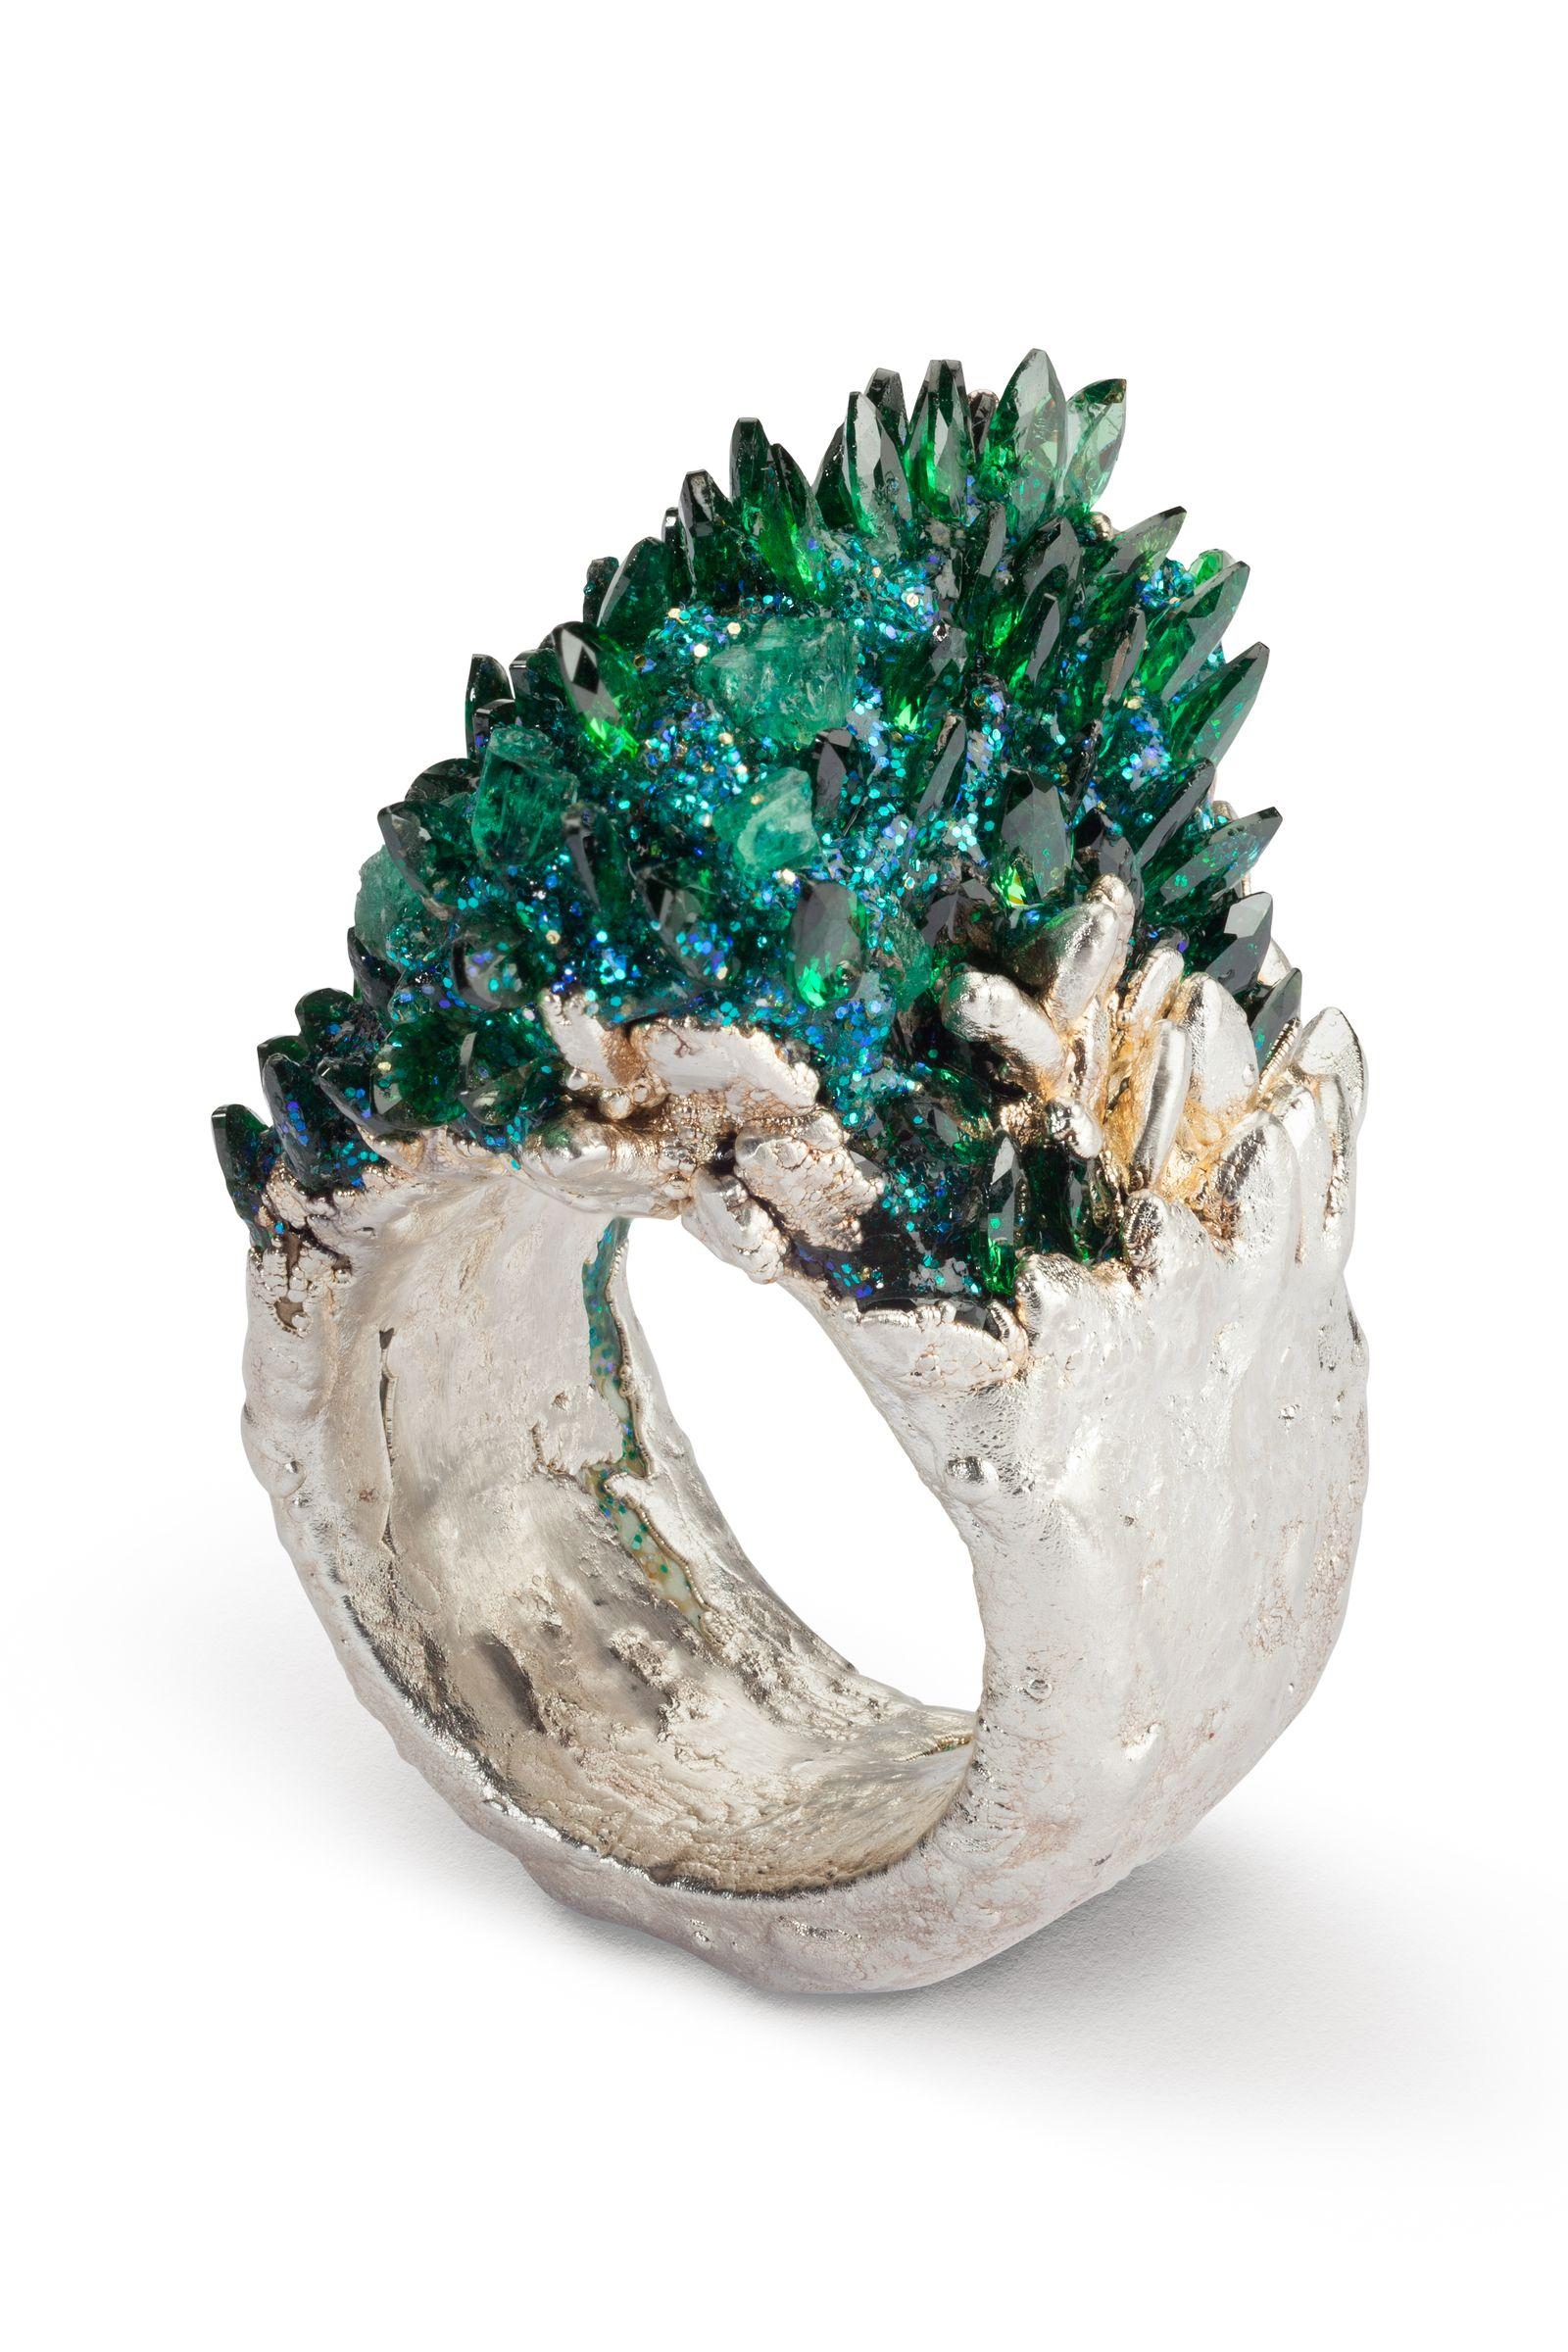 Maud Traon Precious Metals Cast ring encrusted with precious